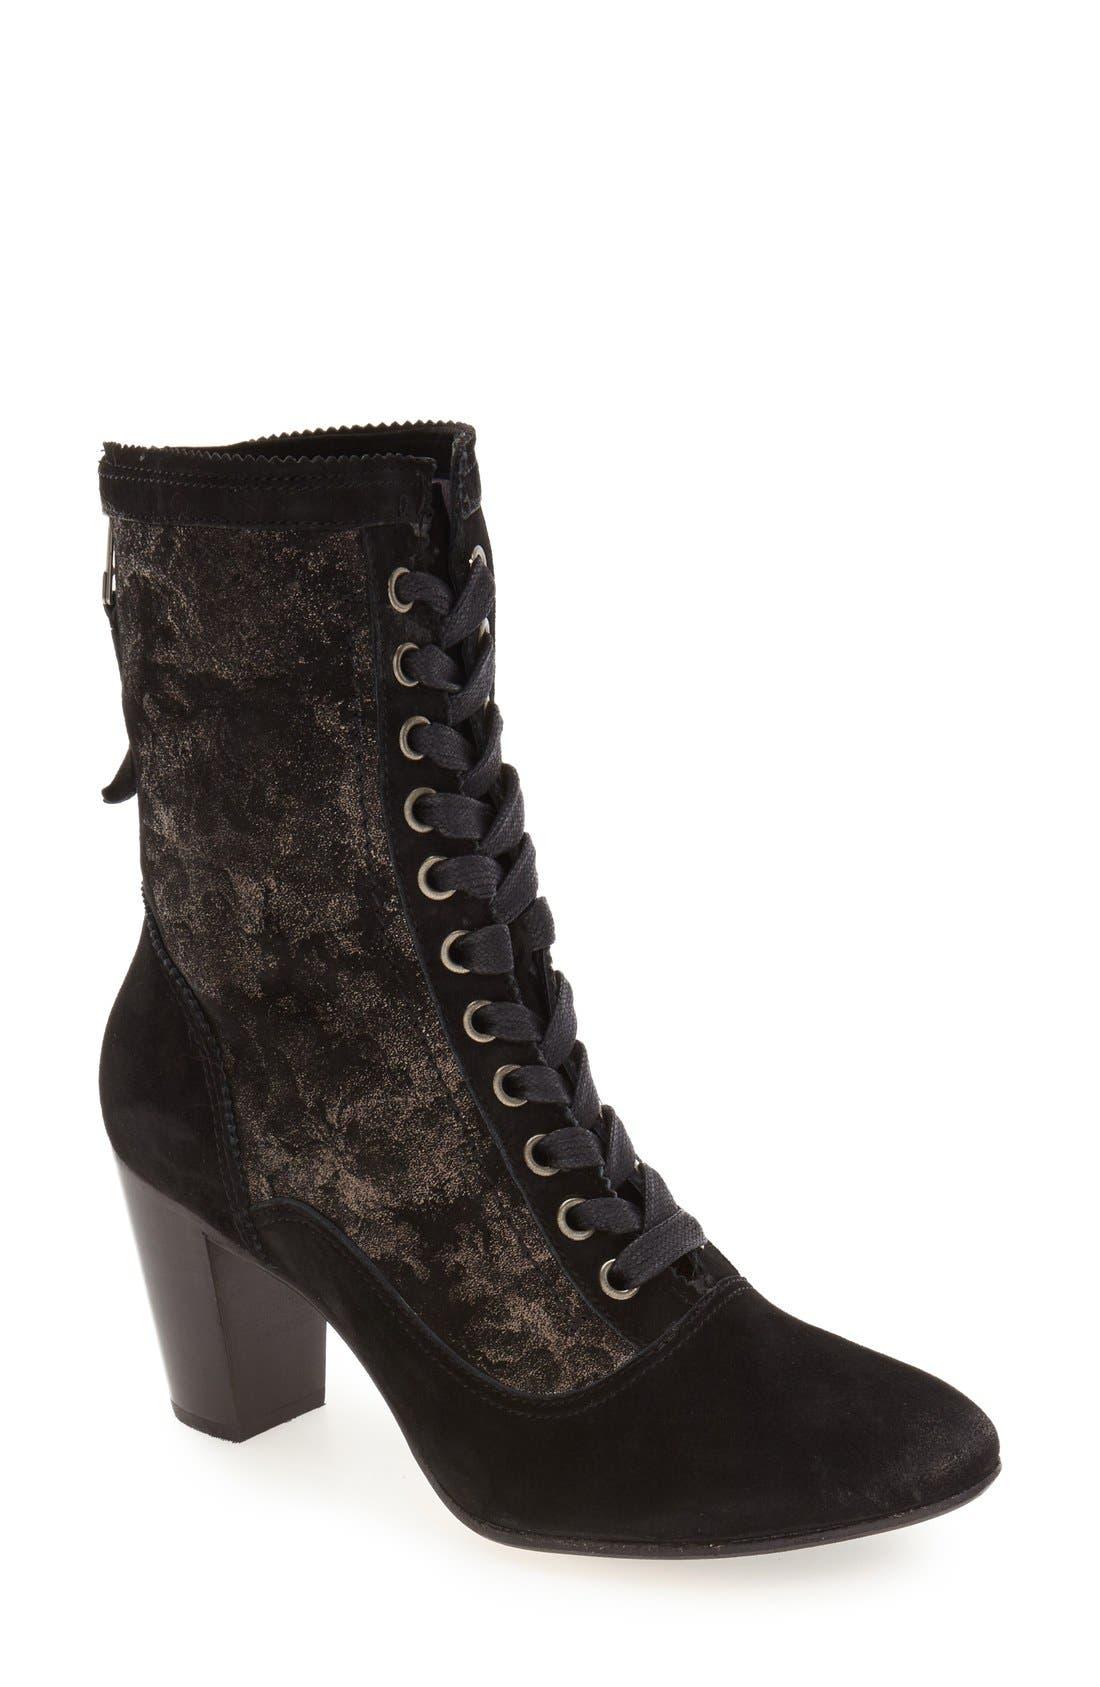 Main Image - Johnston & Murphy 'Adaline' Lace-Up Boot (Women)